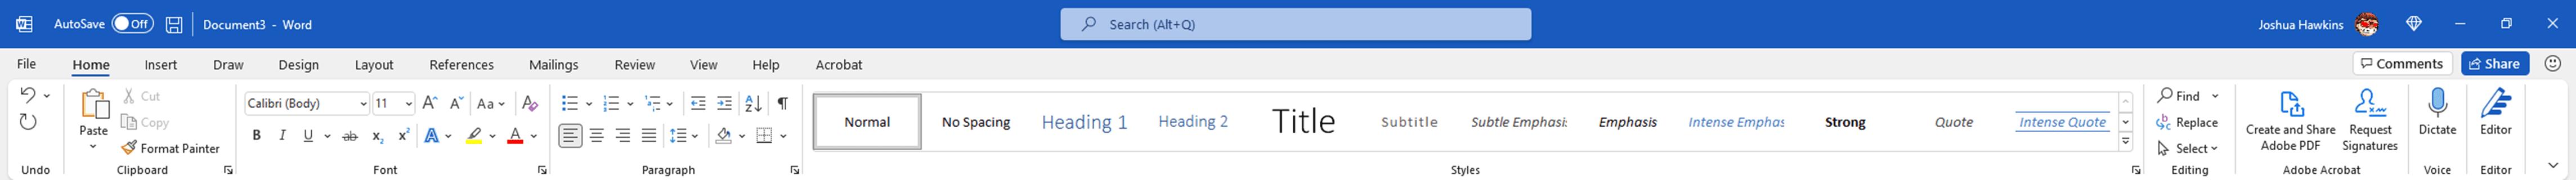 Screenshot of the new Microsoft Office 365 Ribbon.